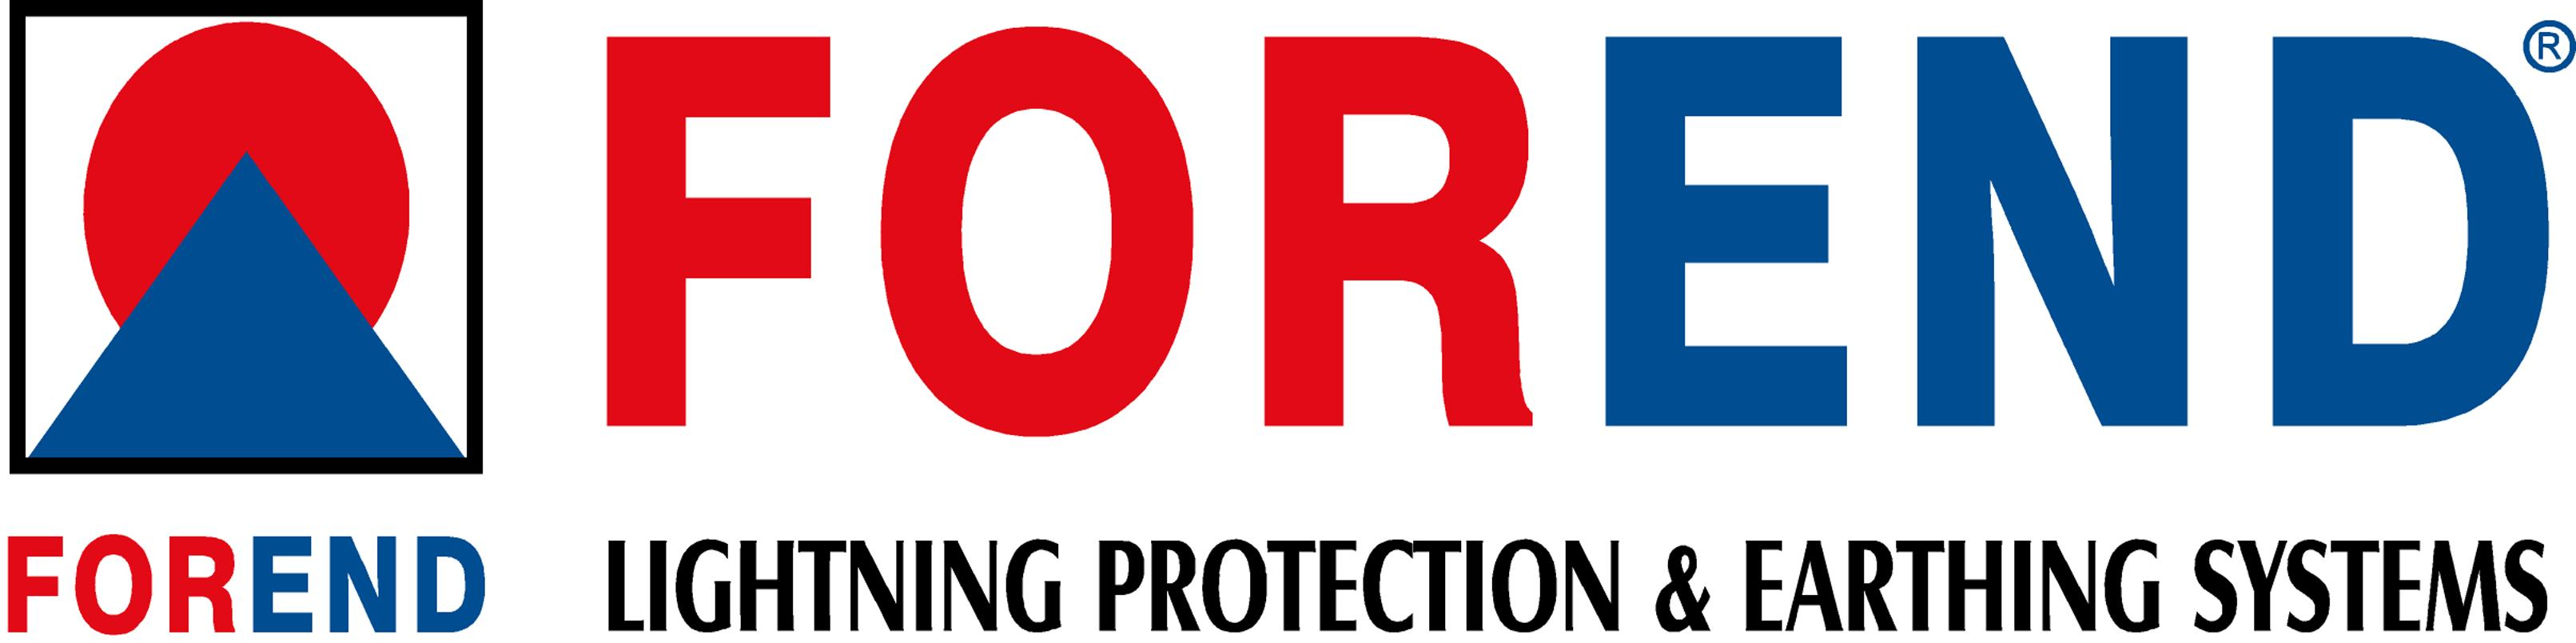 Forend Elektrik Malzemeleri ve Dış Ticaret A.Ş., FOREND LIGHTNING PROTECTION CO